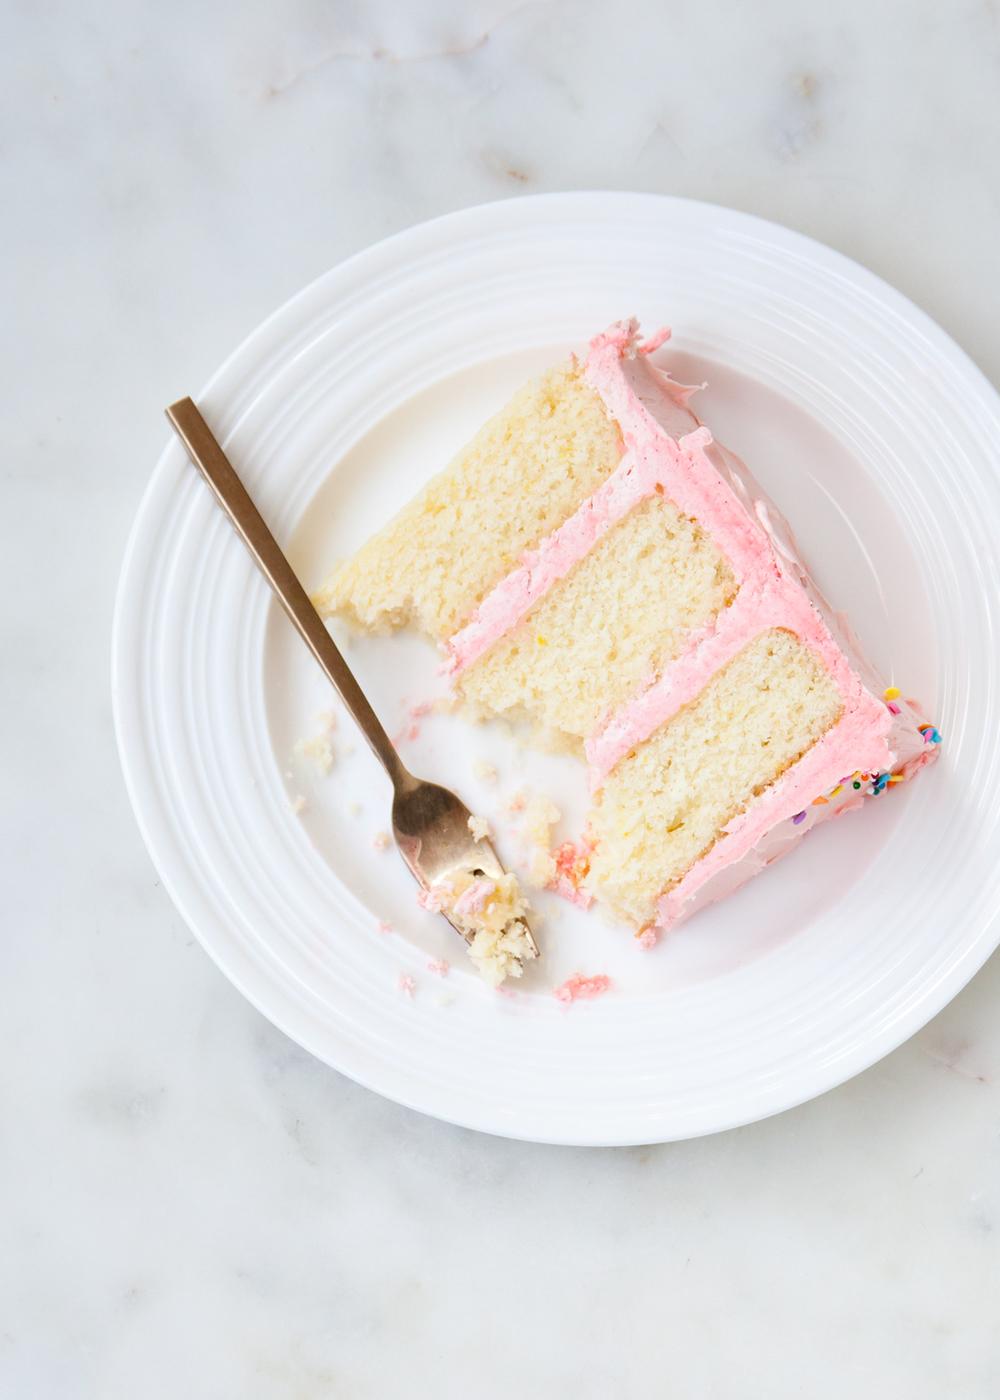 How to make Swiss meringue buttercream - video tutorial.